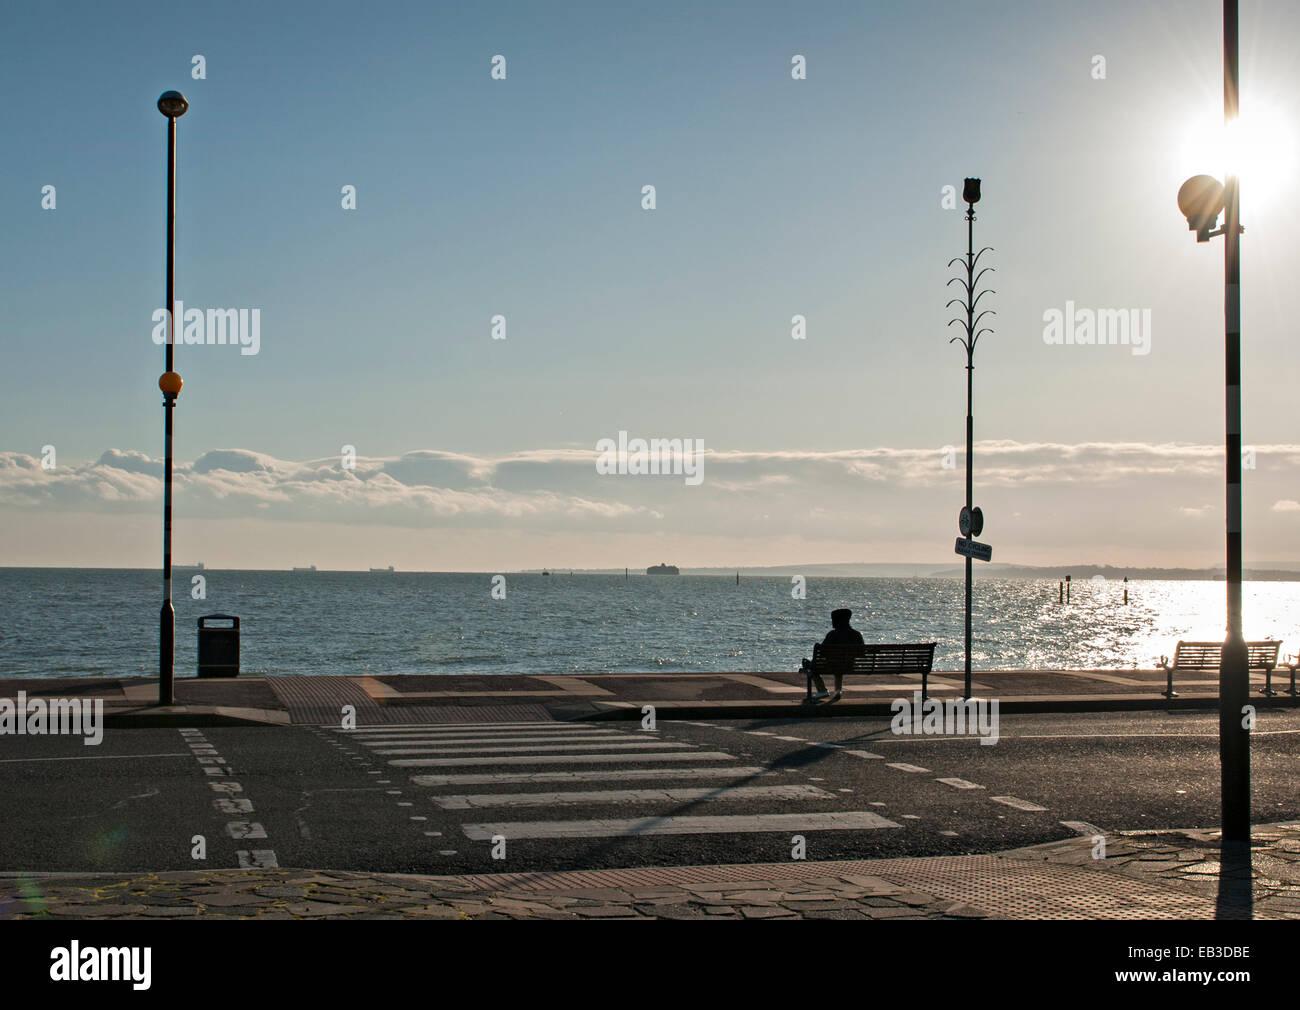 Sothsea Seafront off season Stock Photo